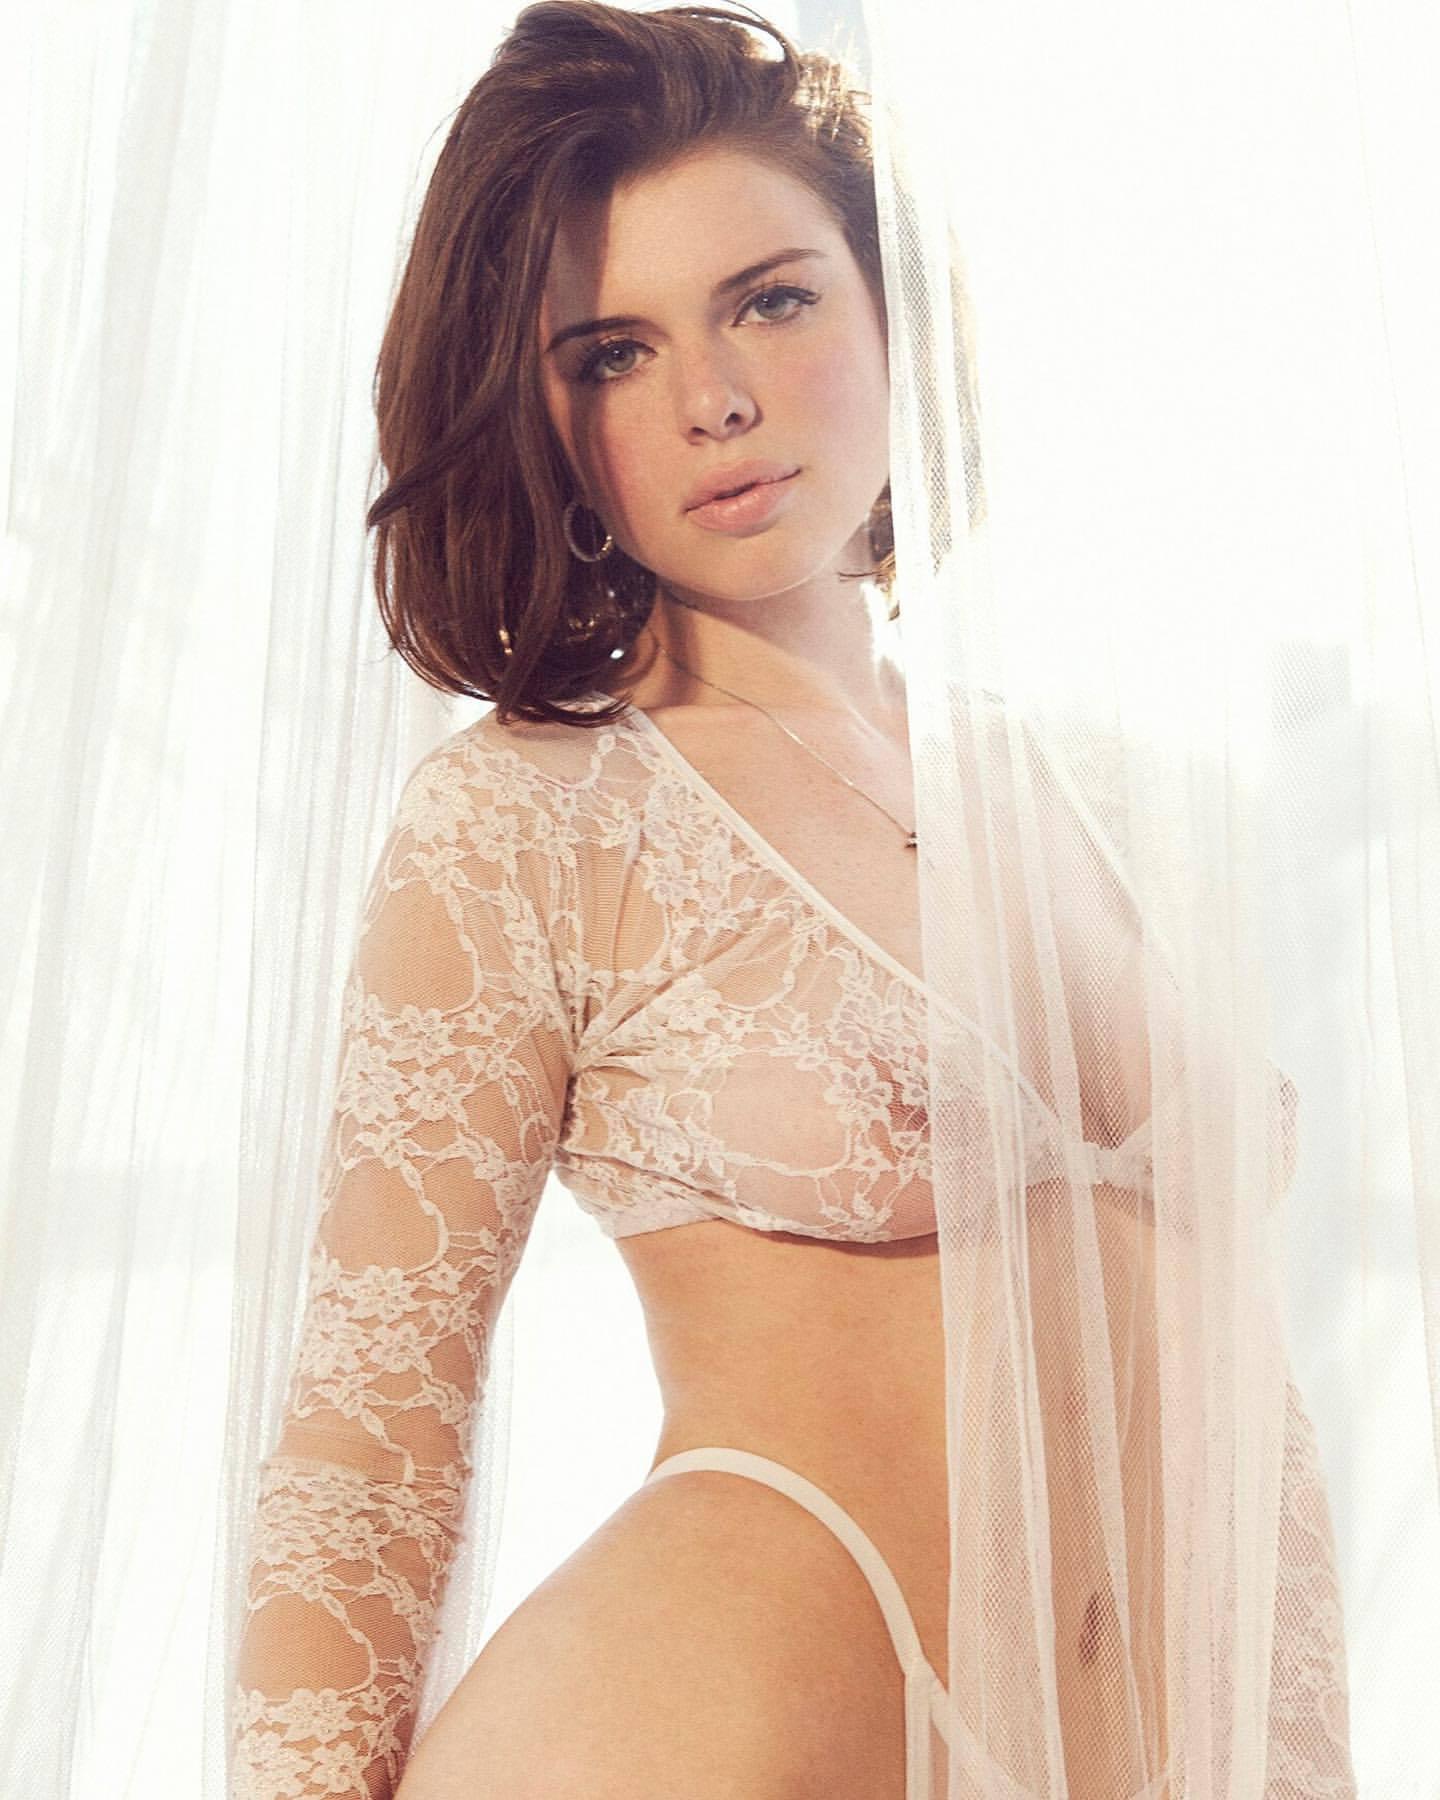 Julia Fox – Beautiful Big Boobs In Sexy Sheer Lingerie 0001